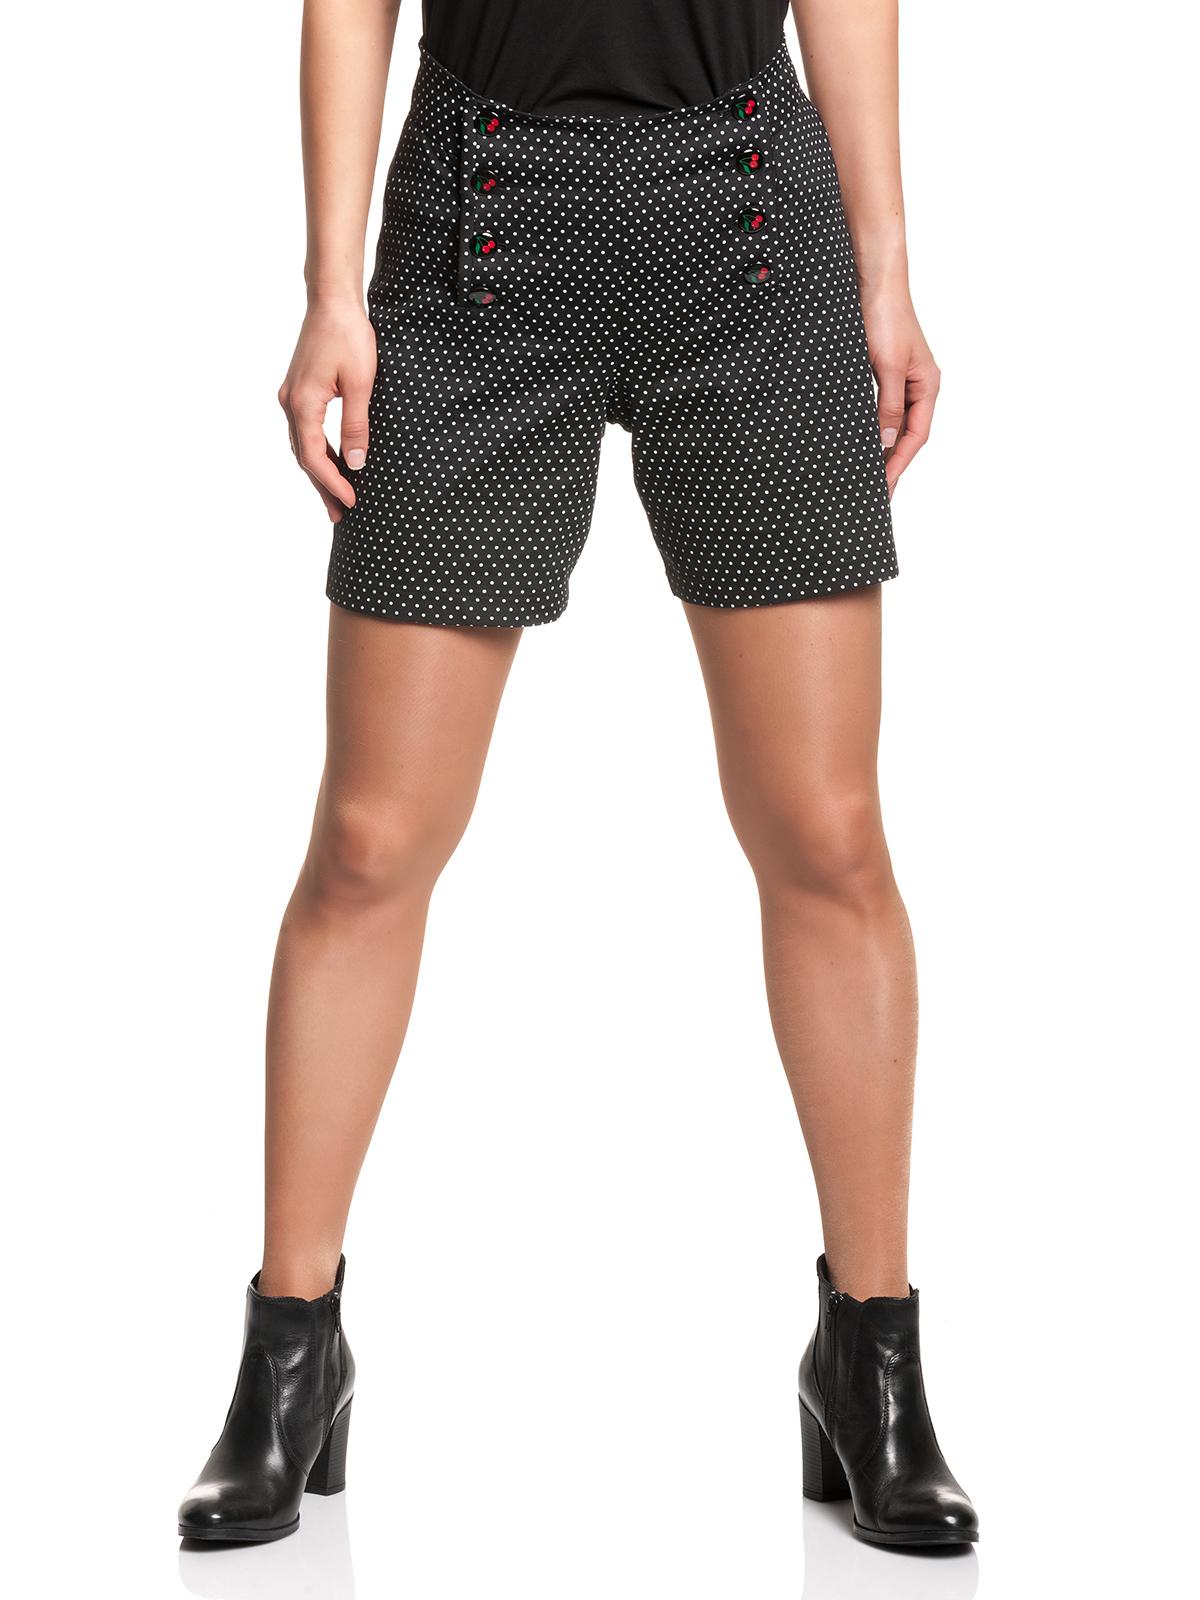 Hosen - Pussy Deluxe Sweet Cherries Dotties Damen Shorts – Größe XL  - Onlineshop NAPO Shop